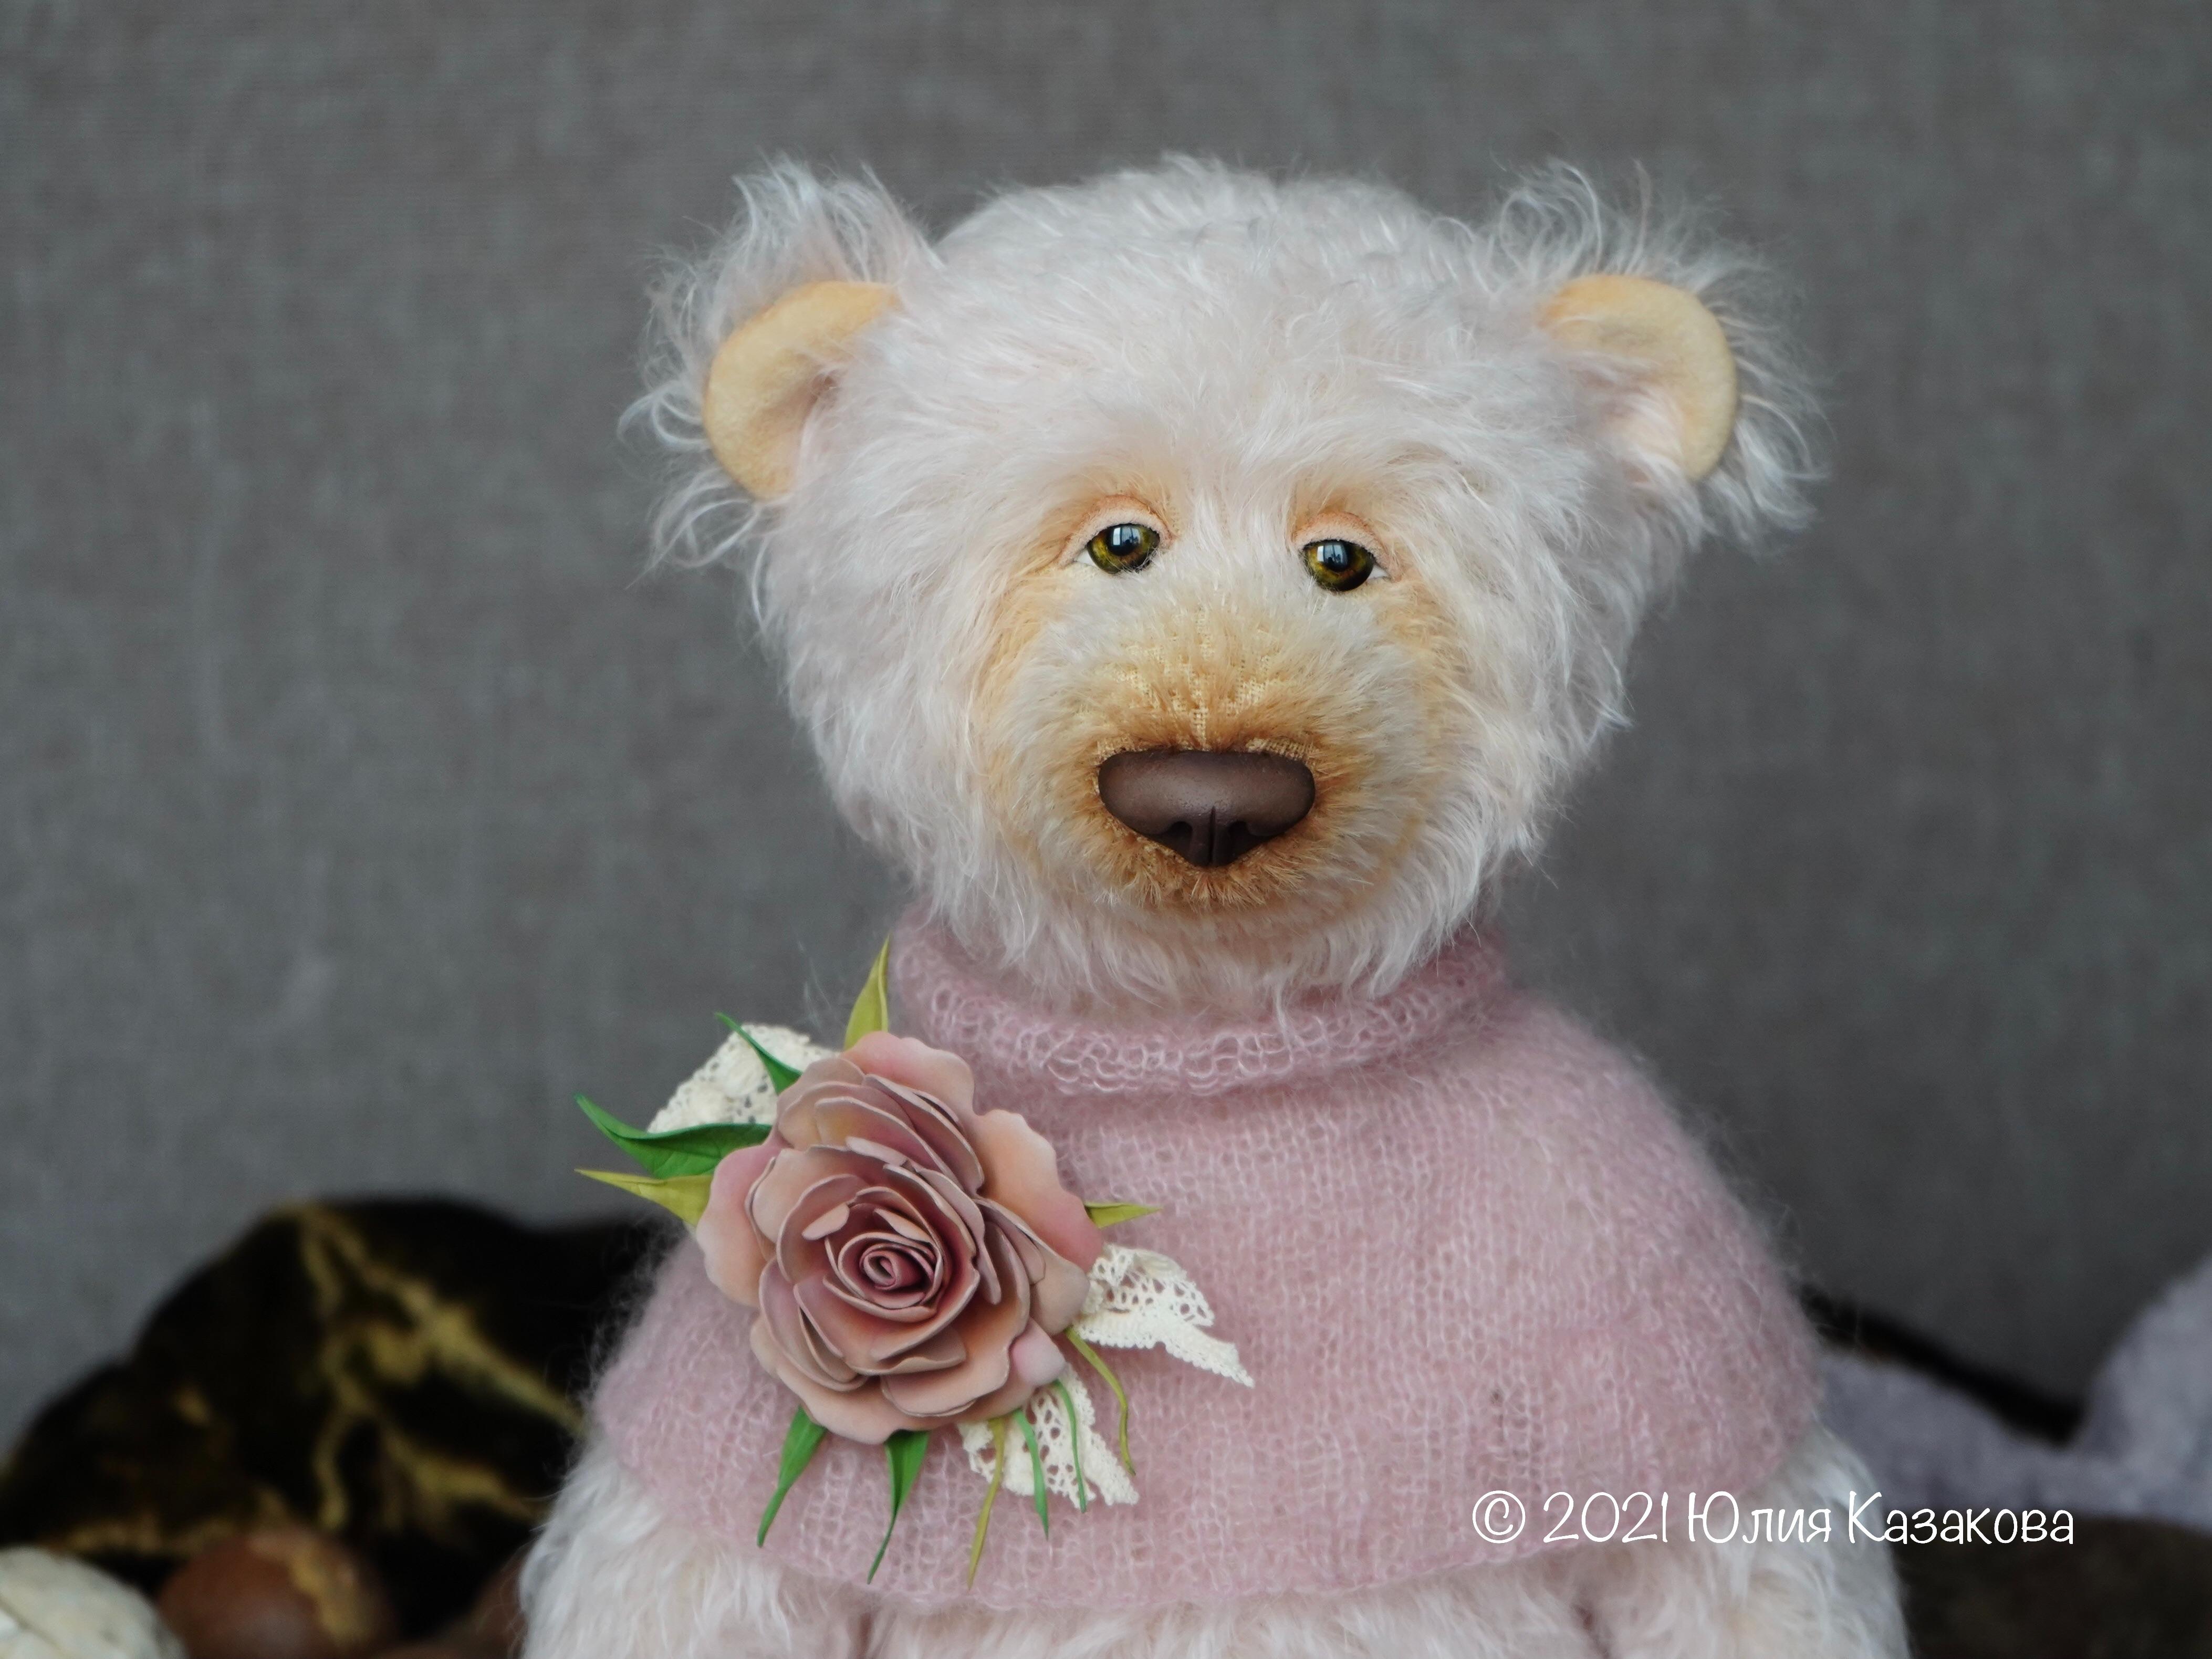 Teddy-bear Charlotte